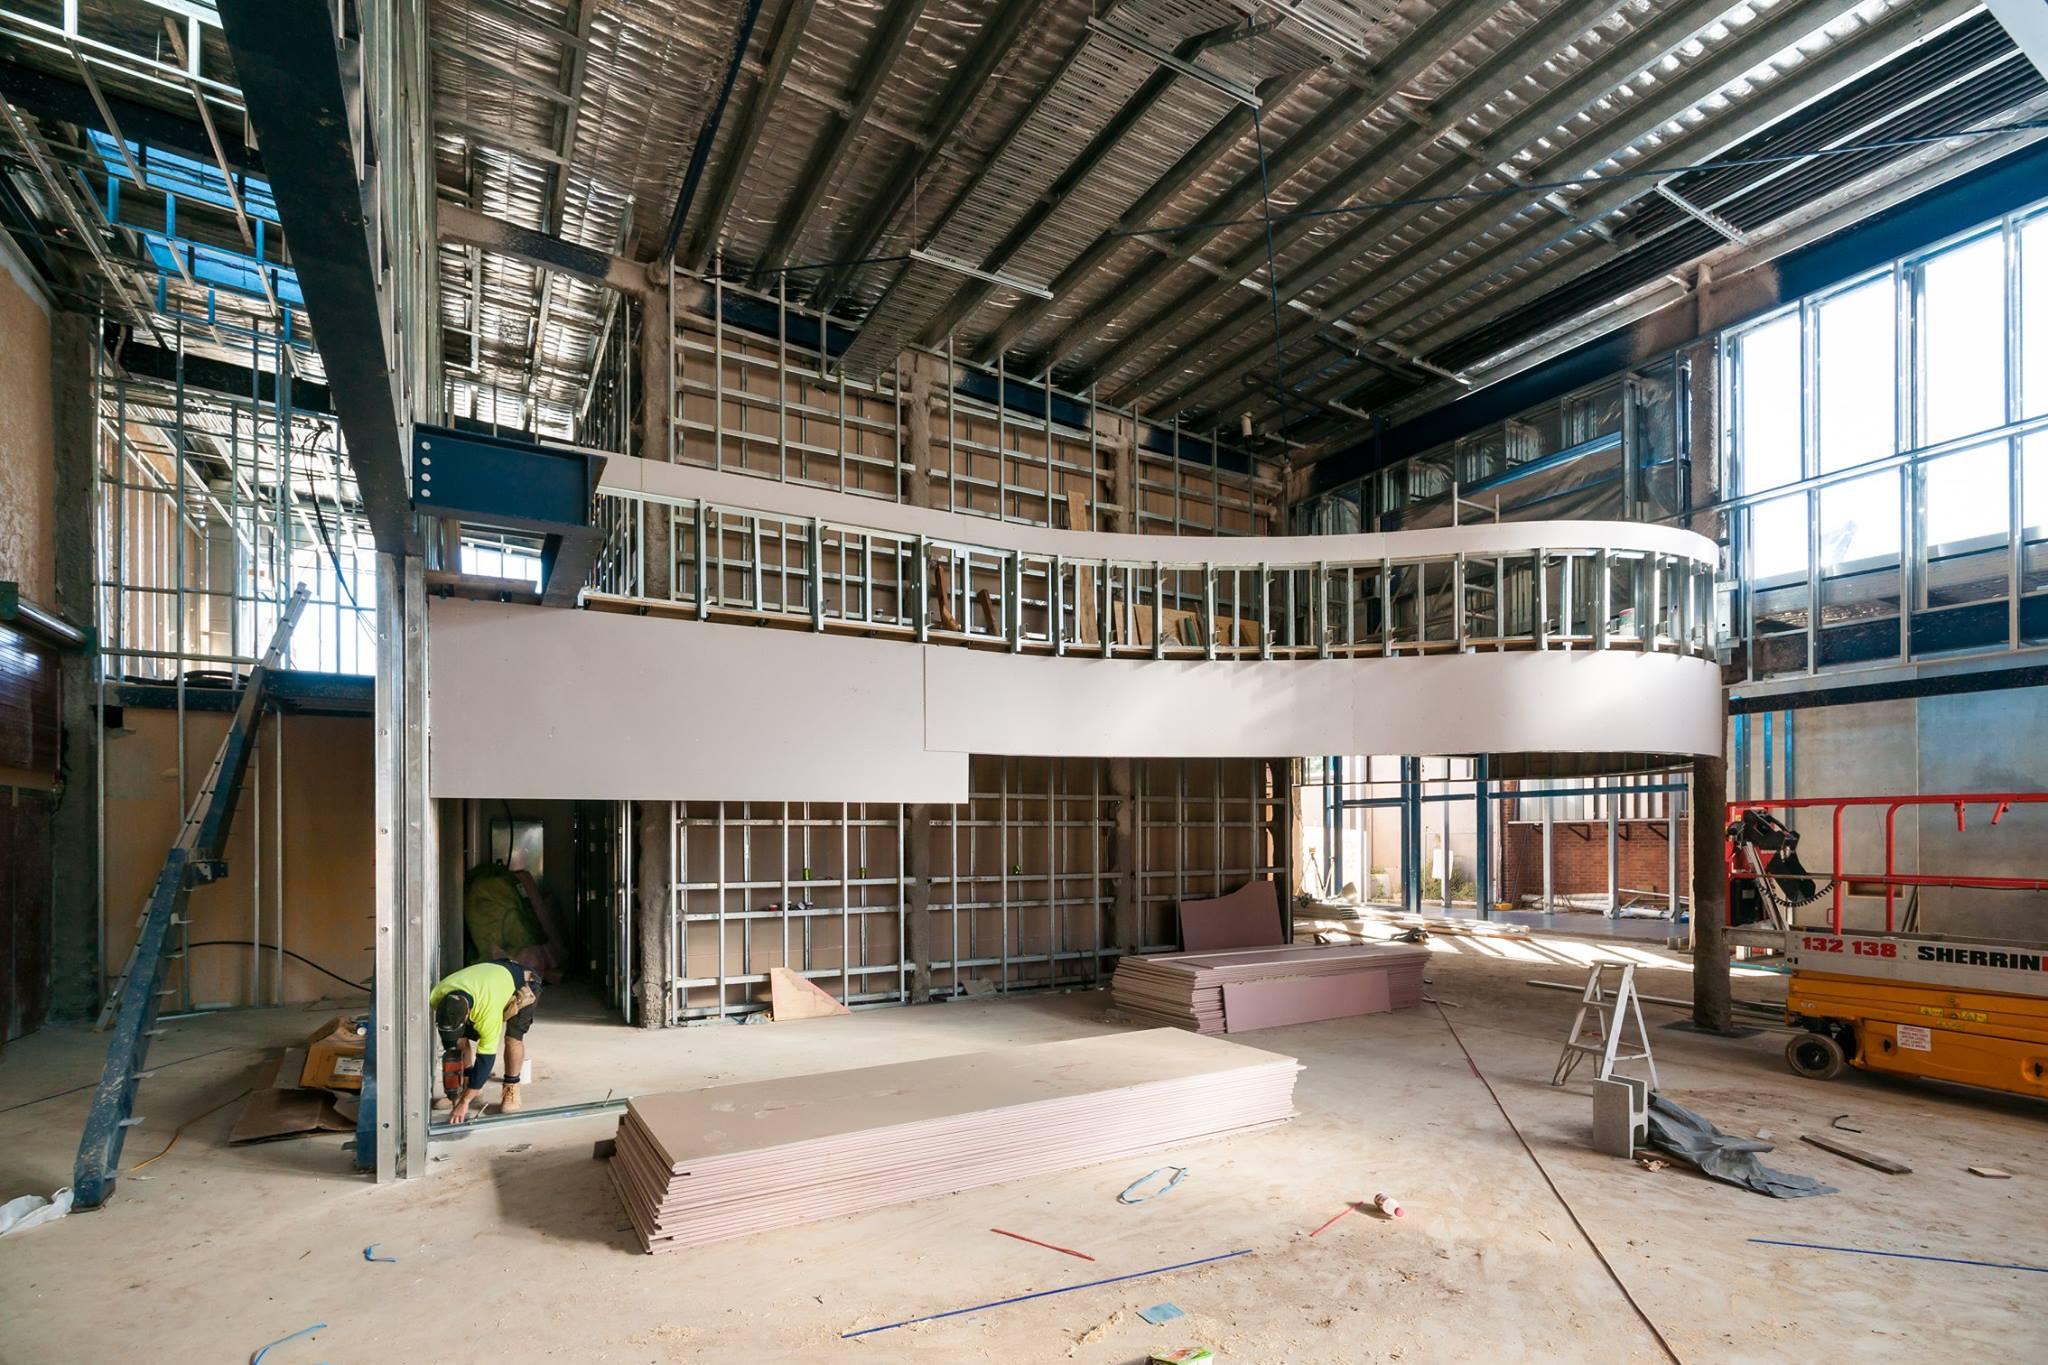 RJ Hanna Constructions